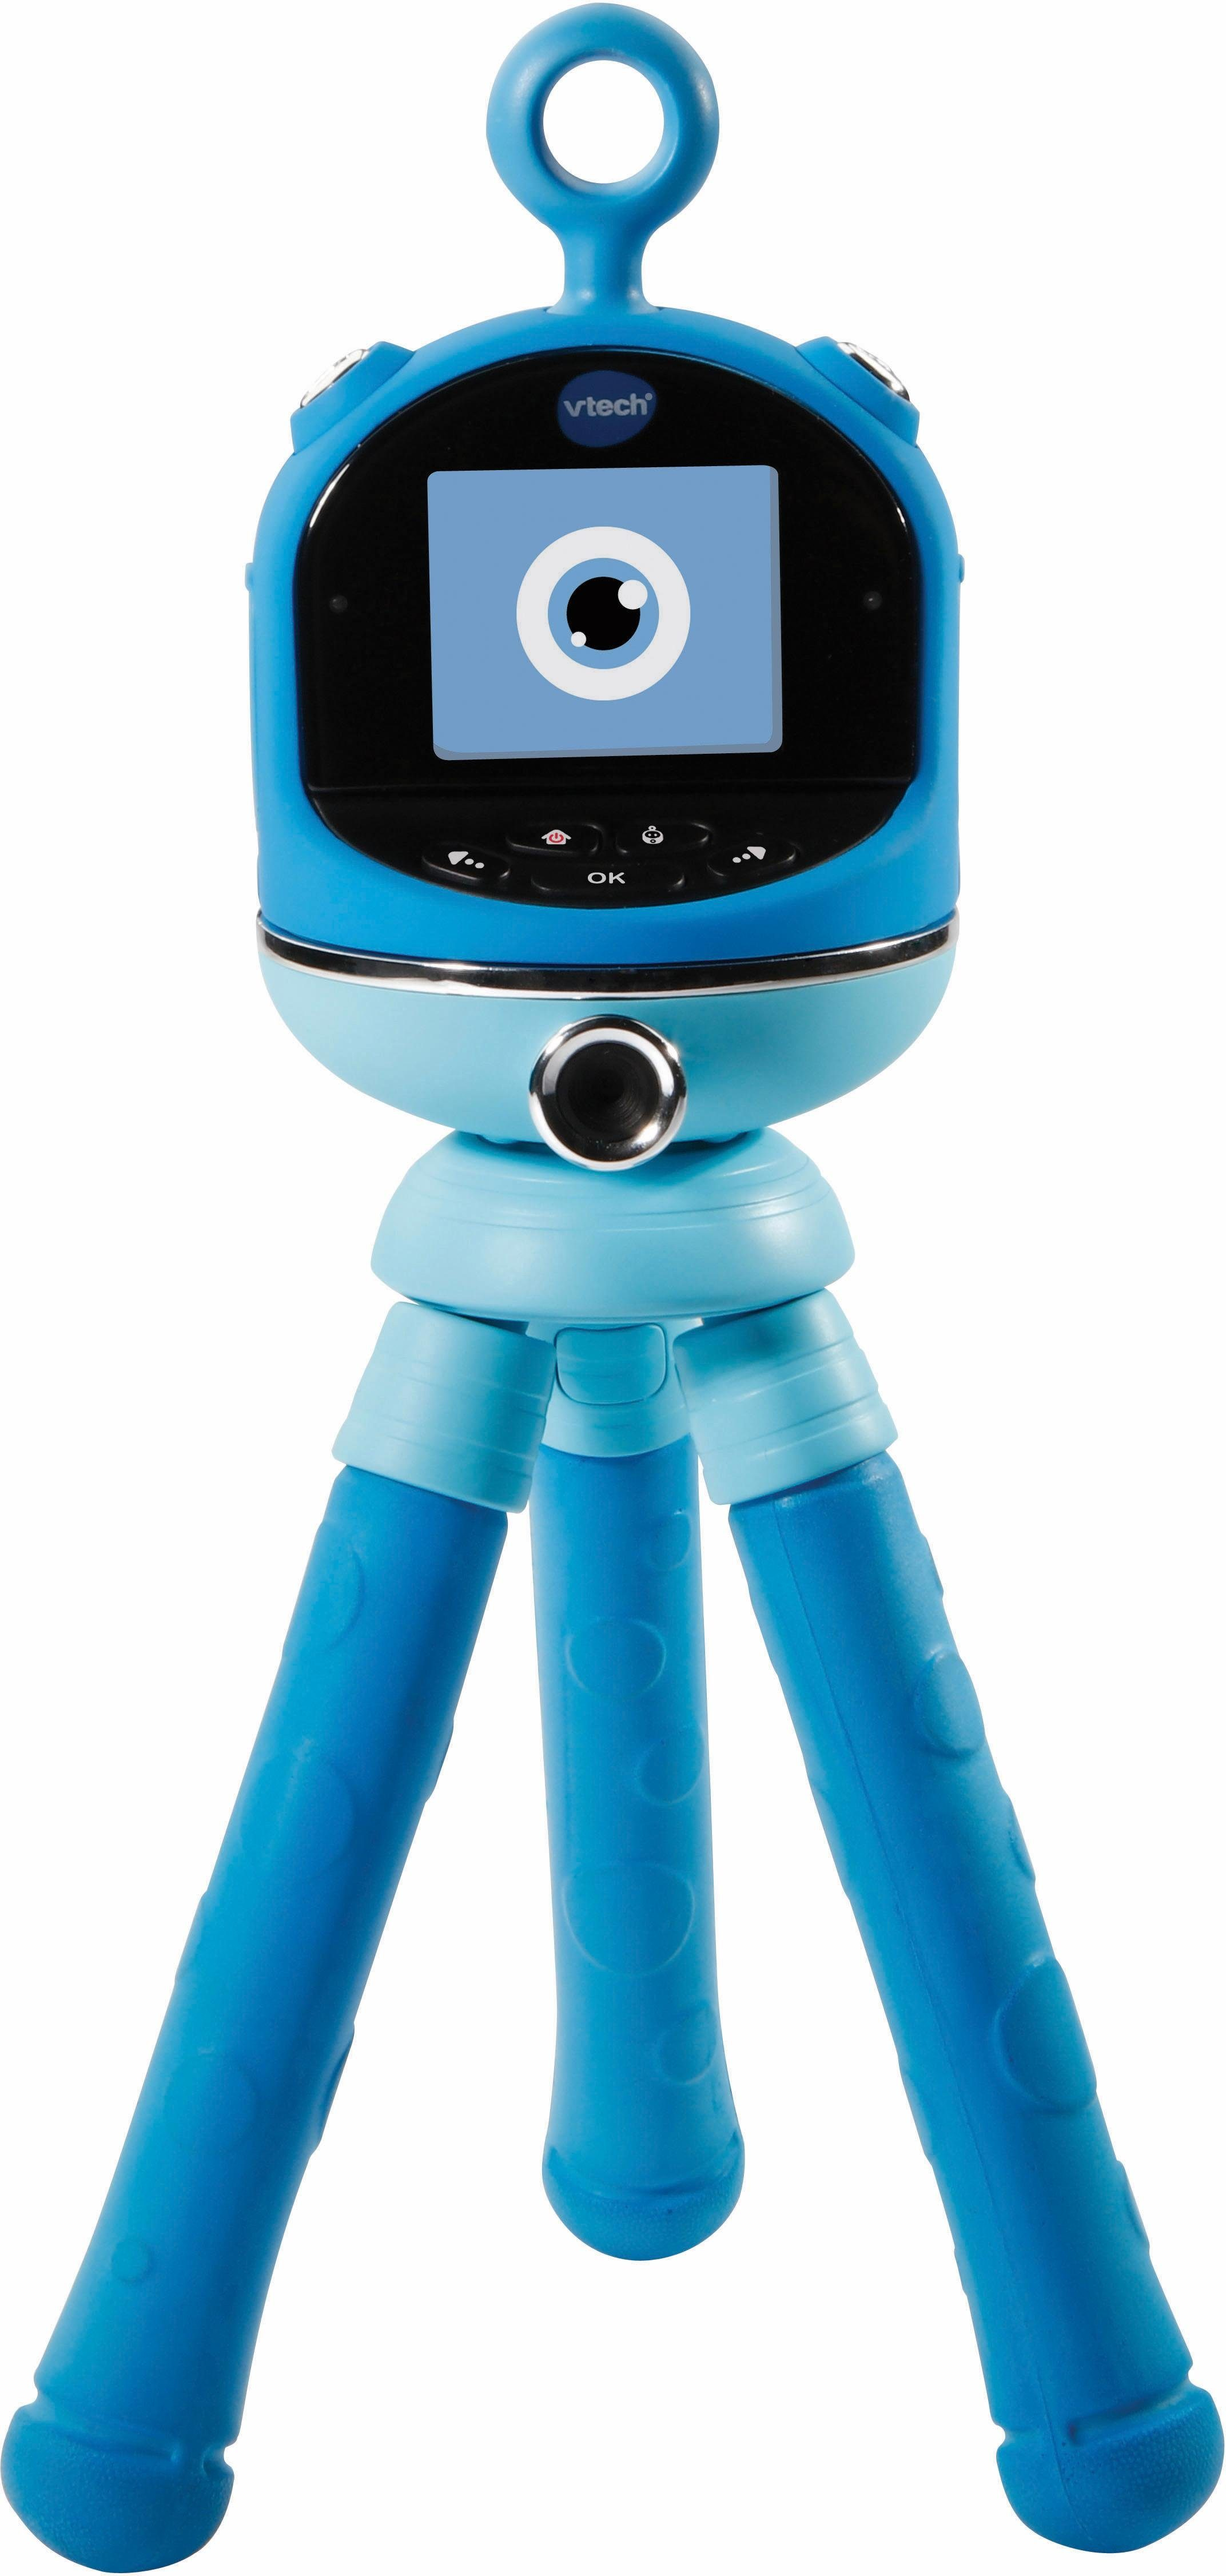 VTech Kinder Digitalkamera, »Kidizoom FLIX blau«